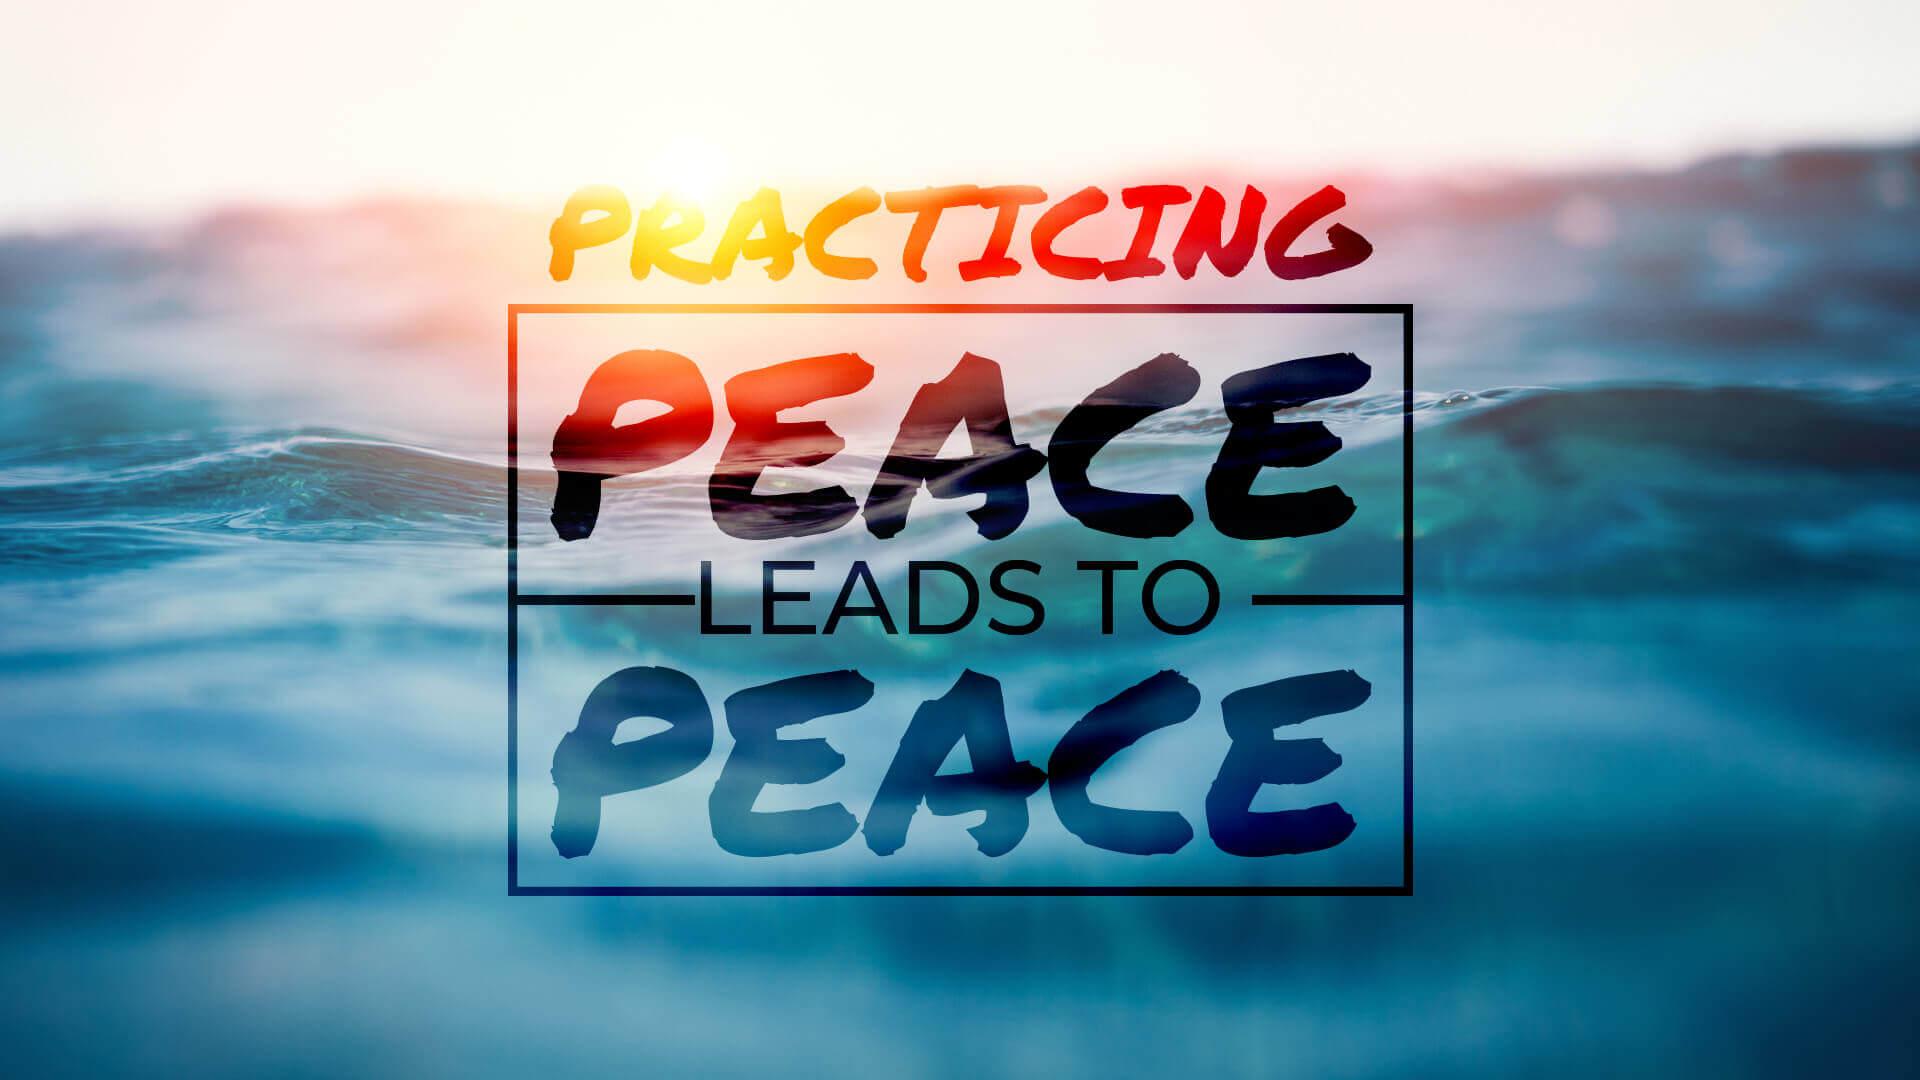 Abundant Life - Practicing Peace Leads to Peace